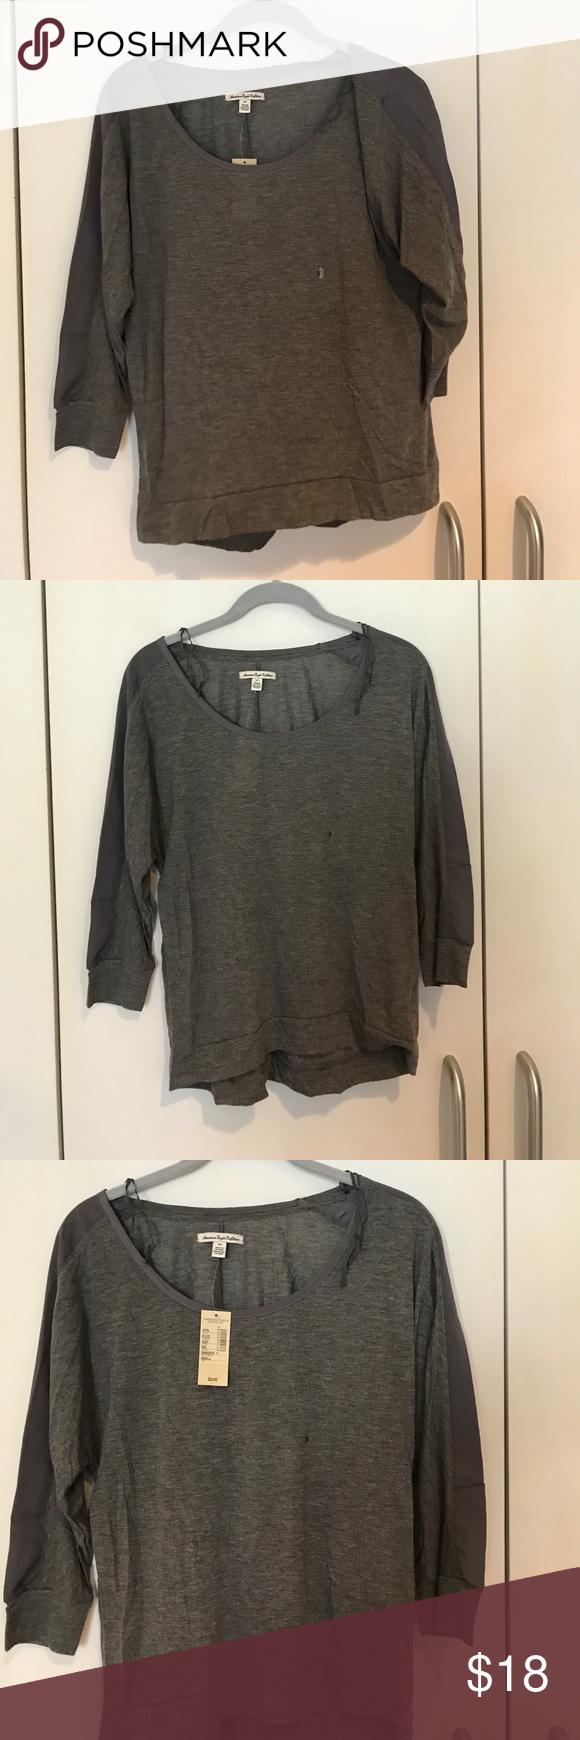 Long sleeve shirt Lobby sleeve cotton shirt with fabric on the arms Tops Tees - Long Sleeve